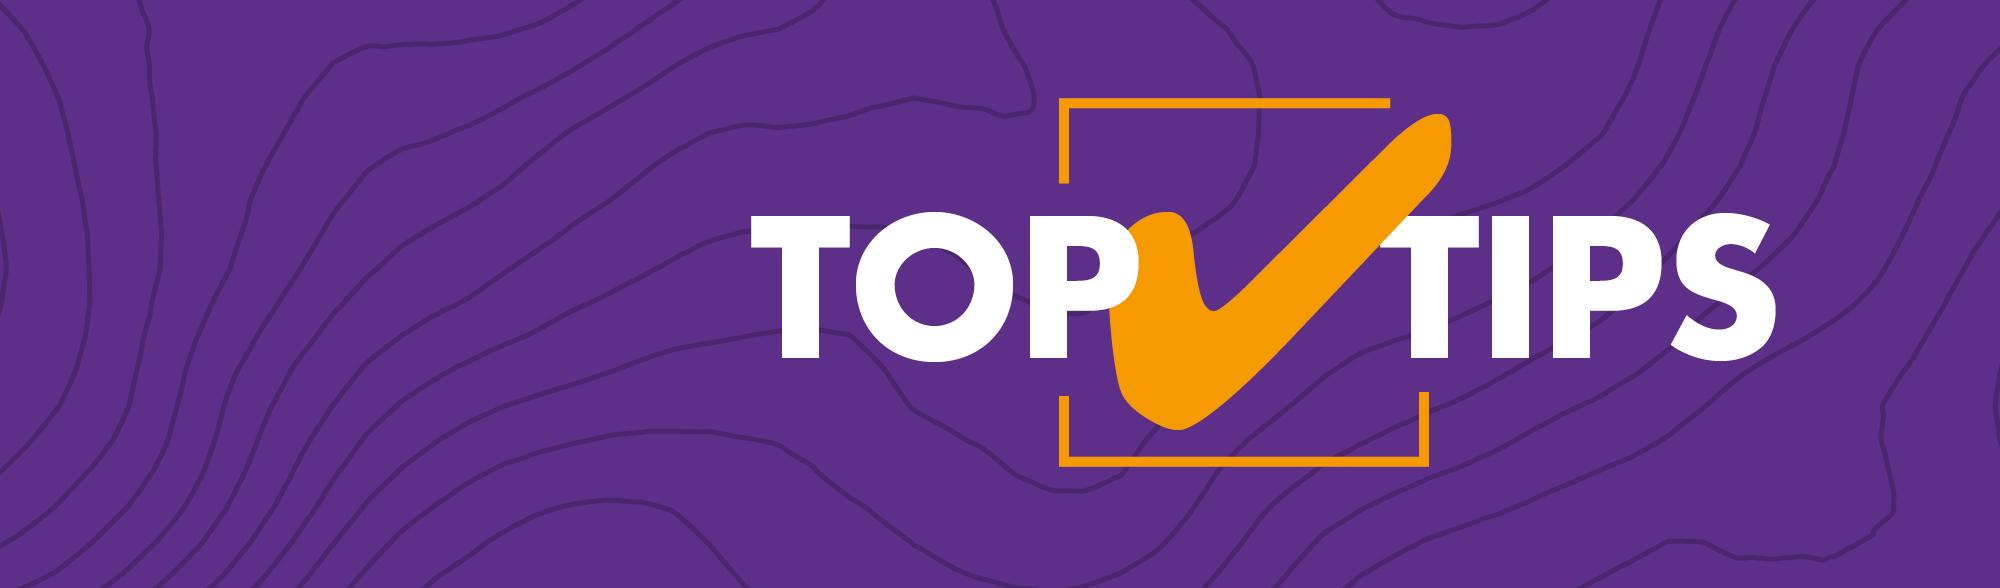 Top tips banner